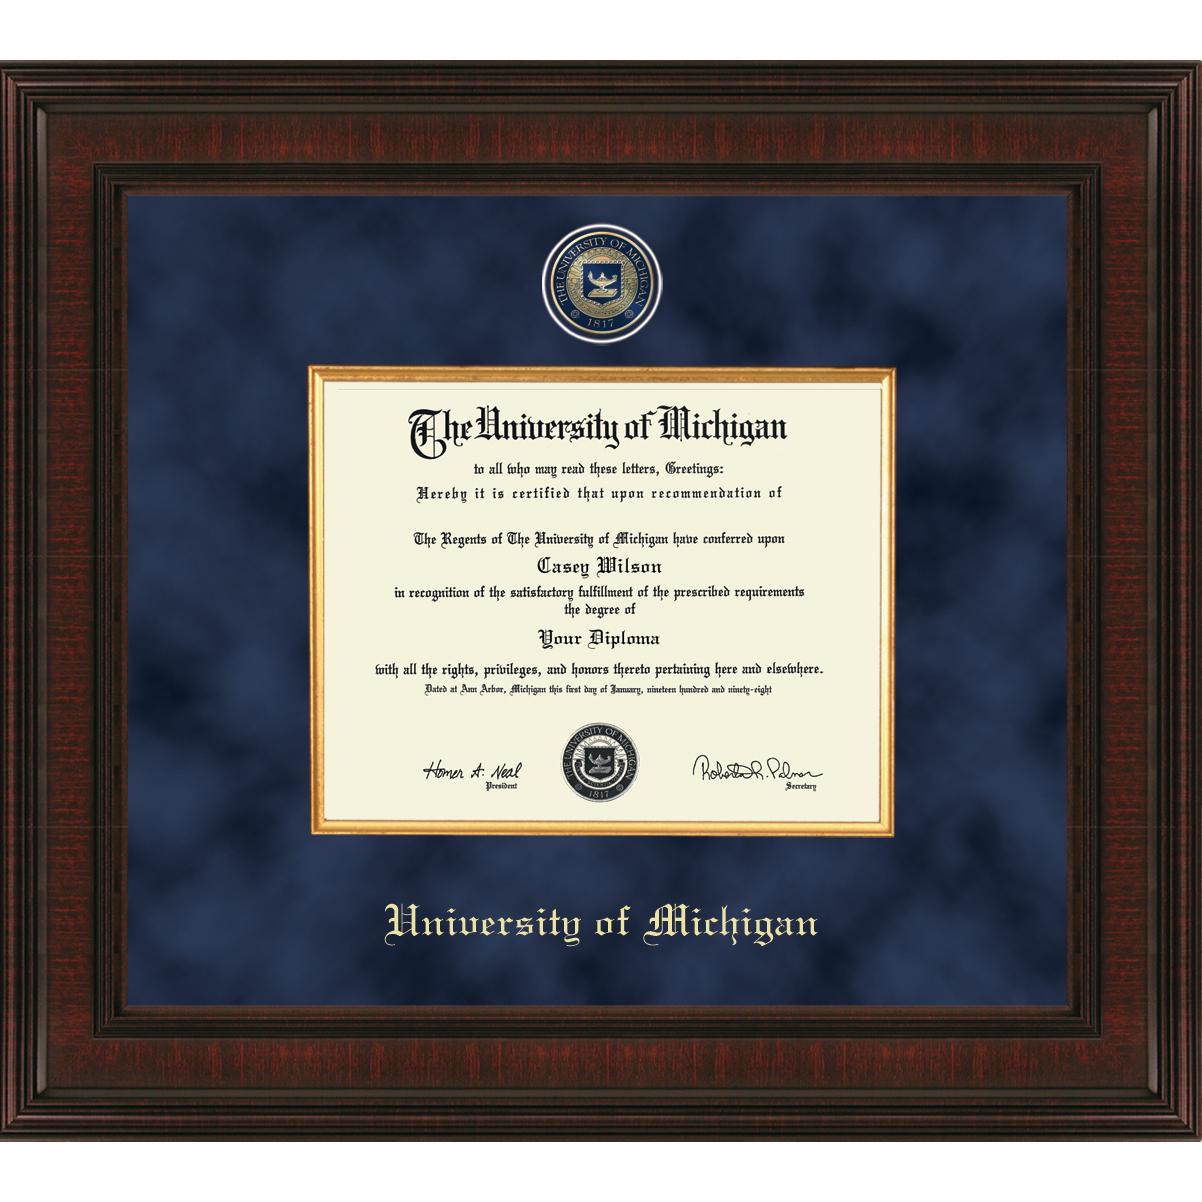 University of Michigan Diploma Frame - Excelsior | Graduation Gift